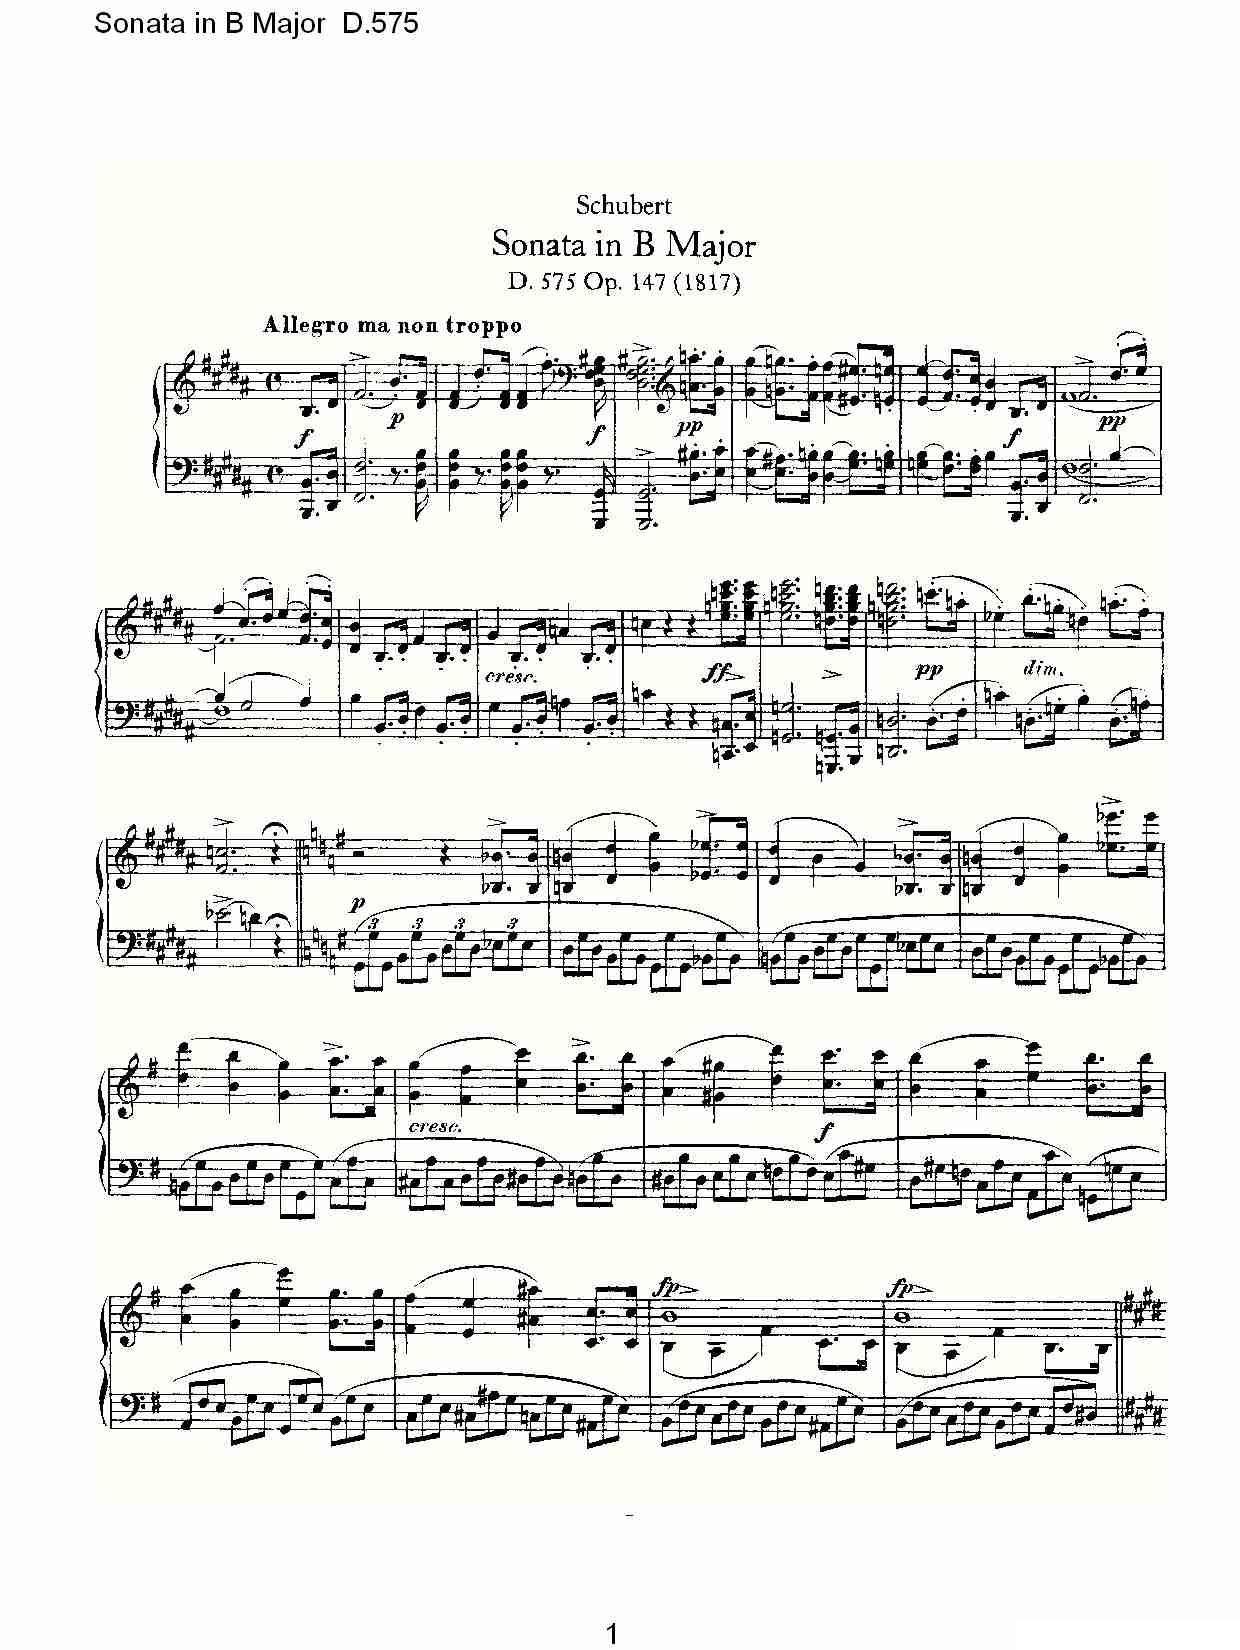 575(b大调奏鸣曲 d.575)